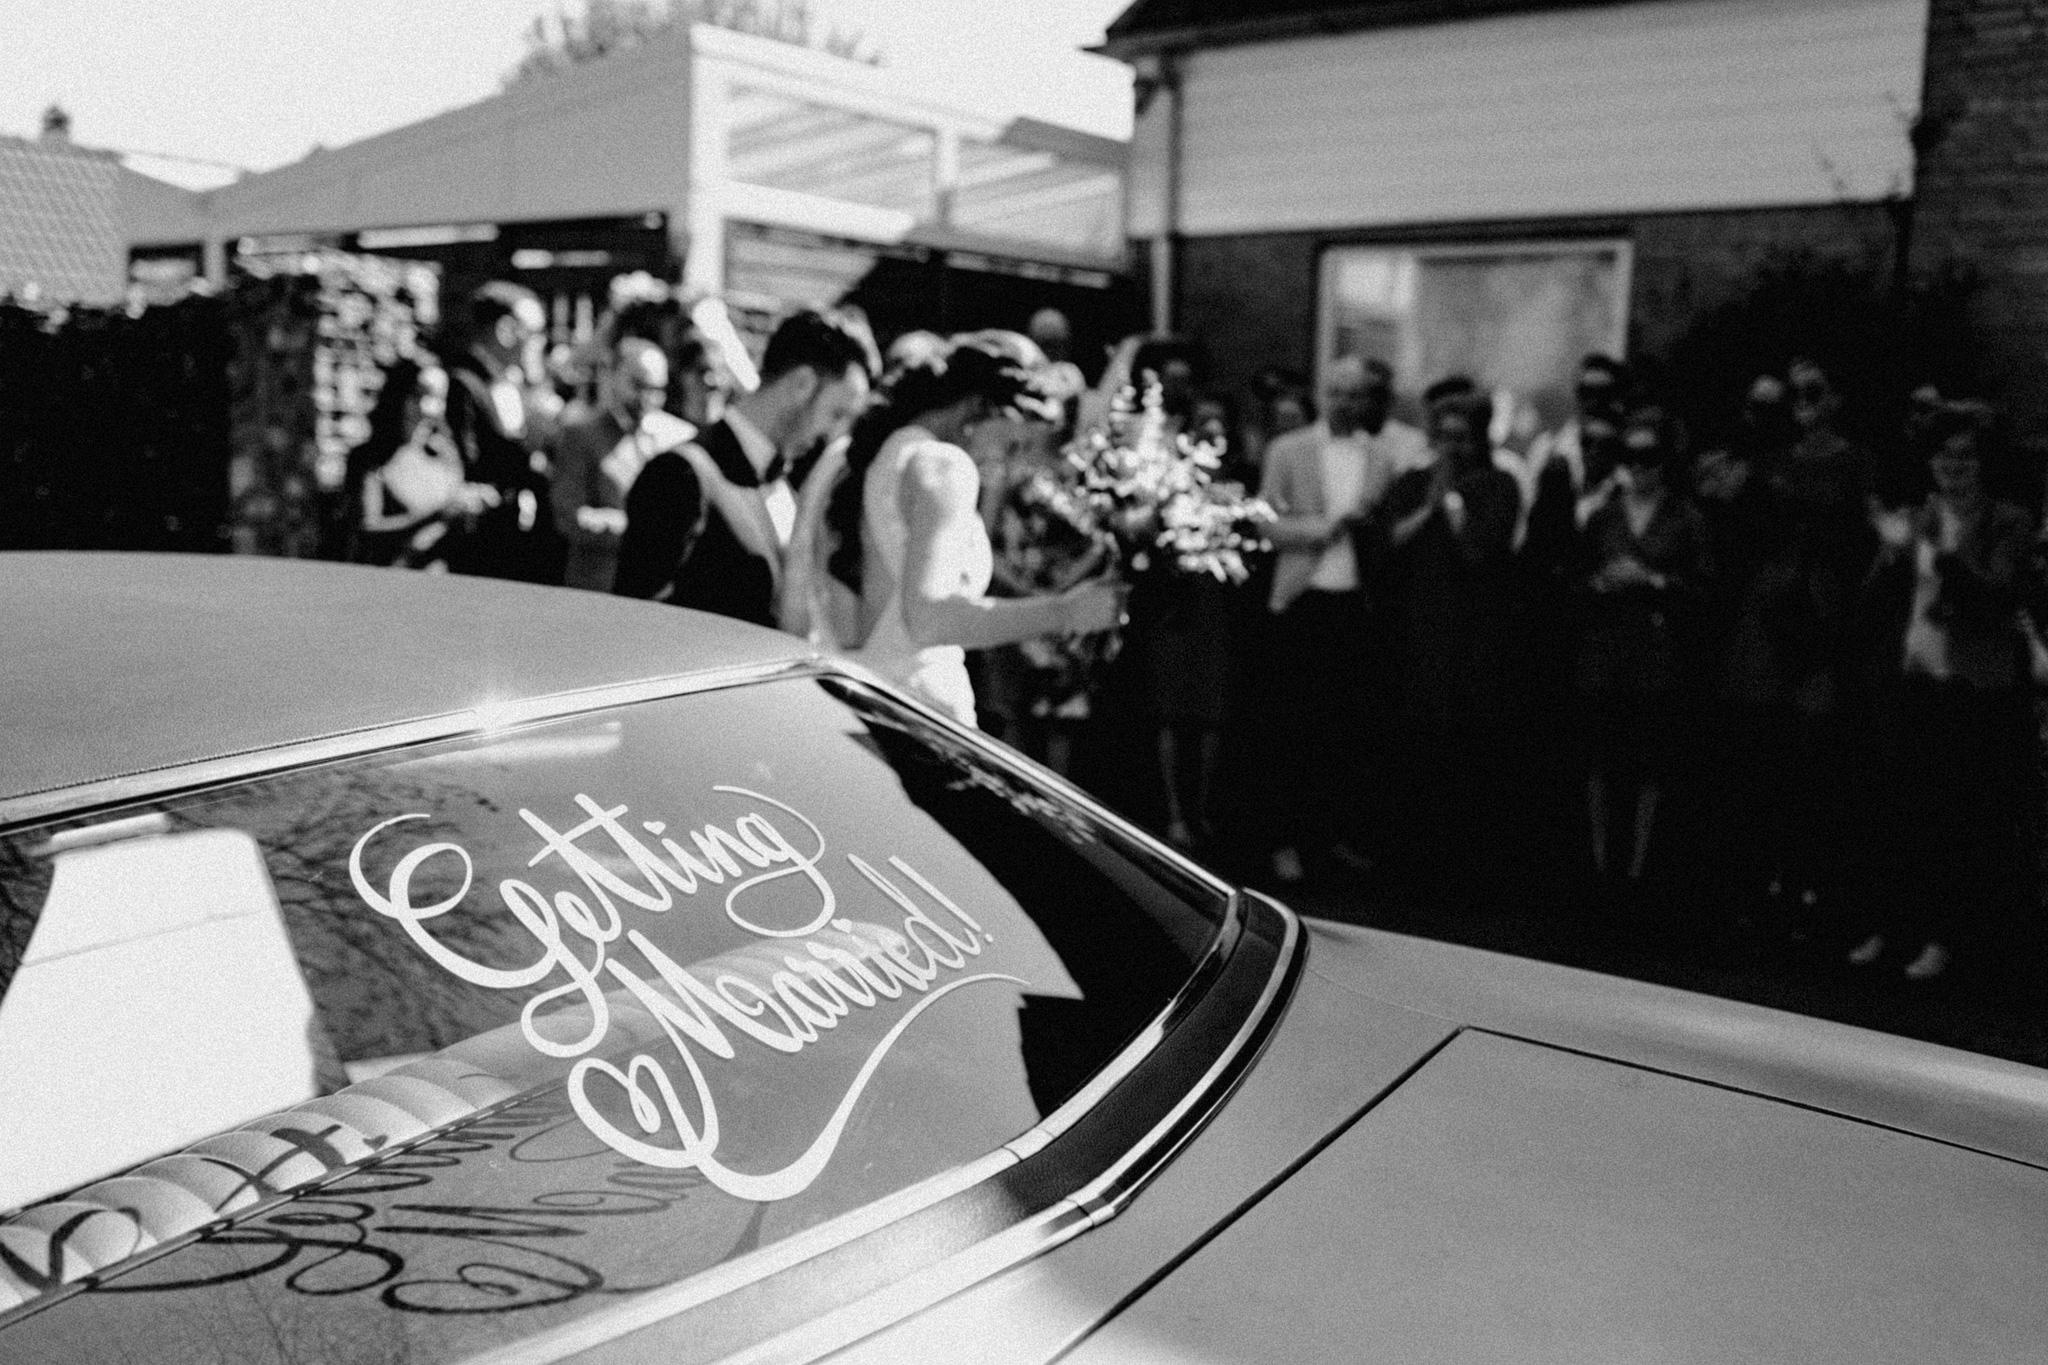 Trouwauto Ford Ltd 1969 met Getting Married tekst op achteruit